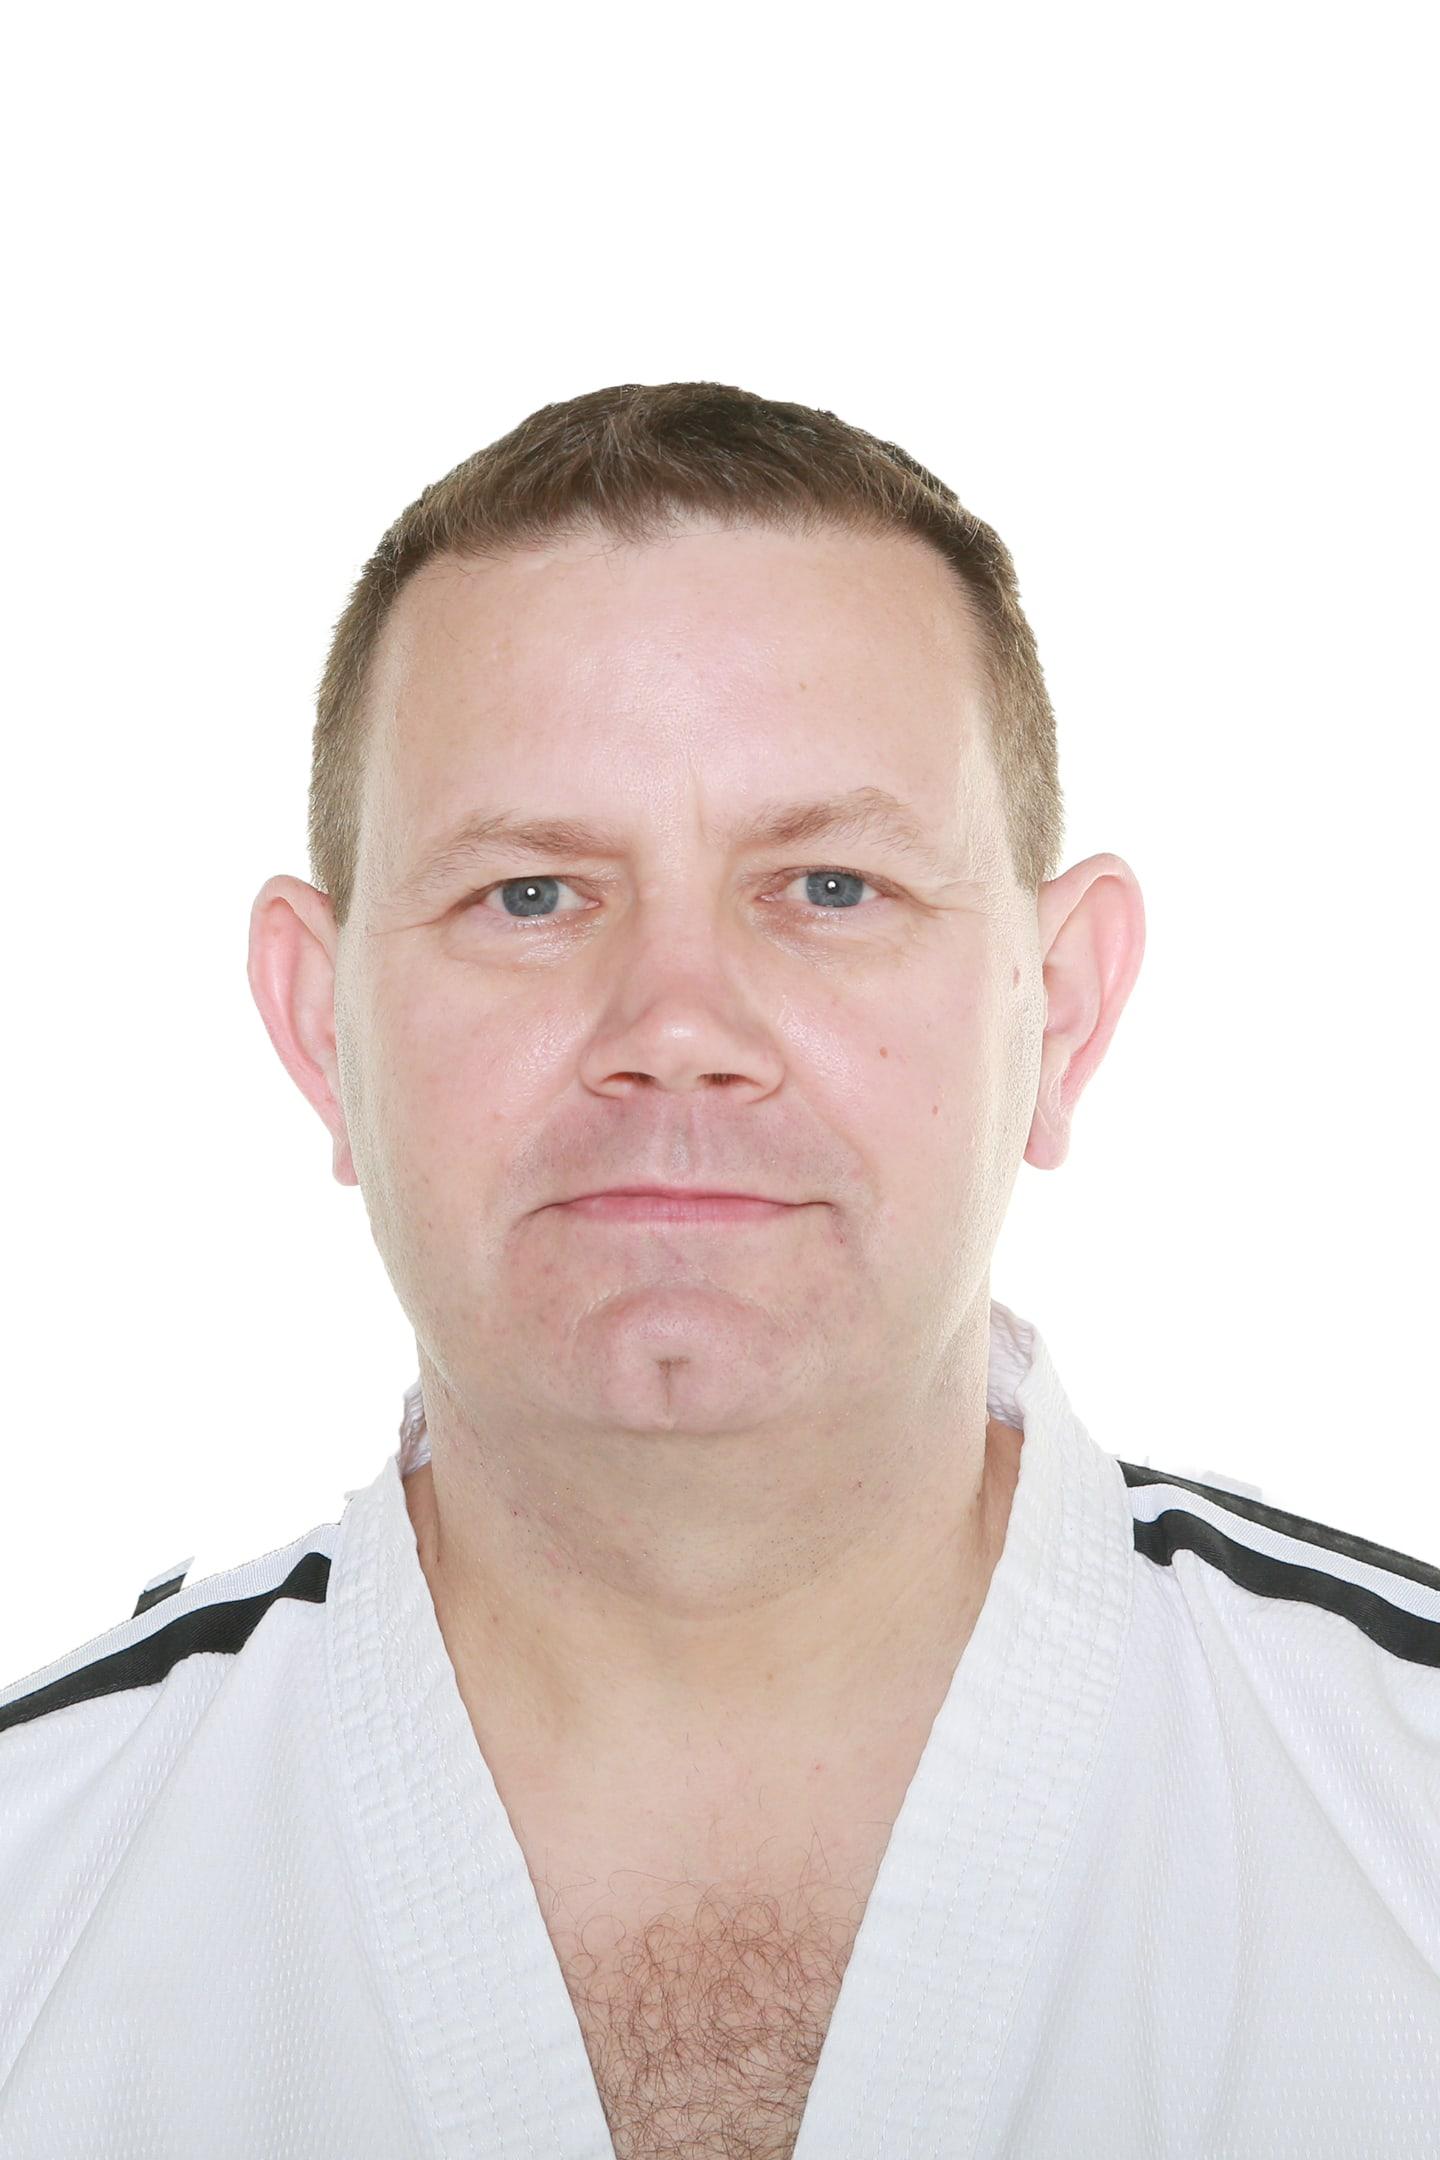 Terry Donnelly in Balbriggan - Elite Taekwondo Academy